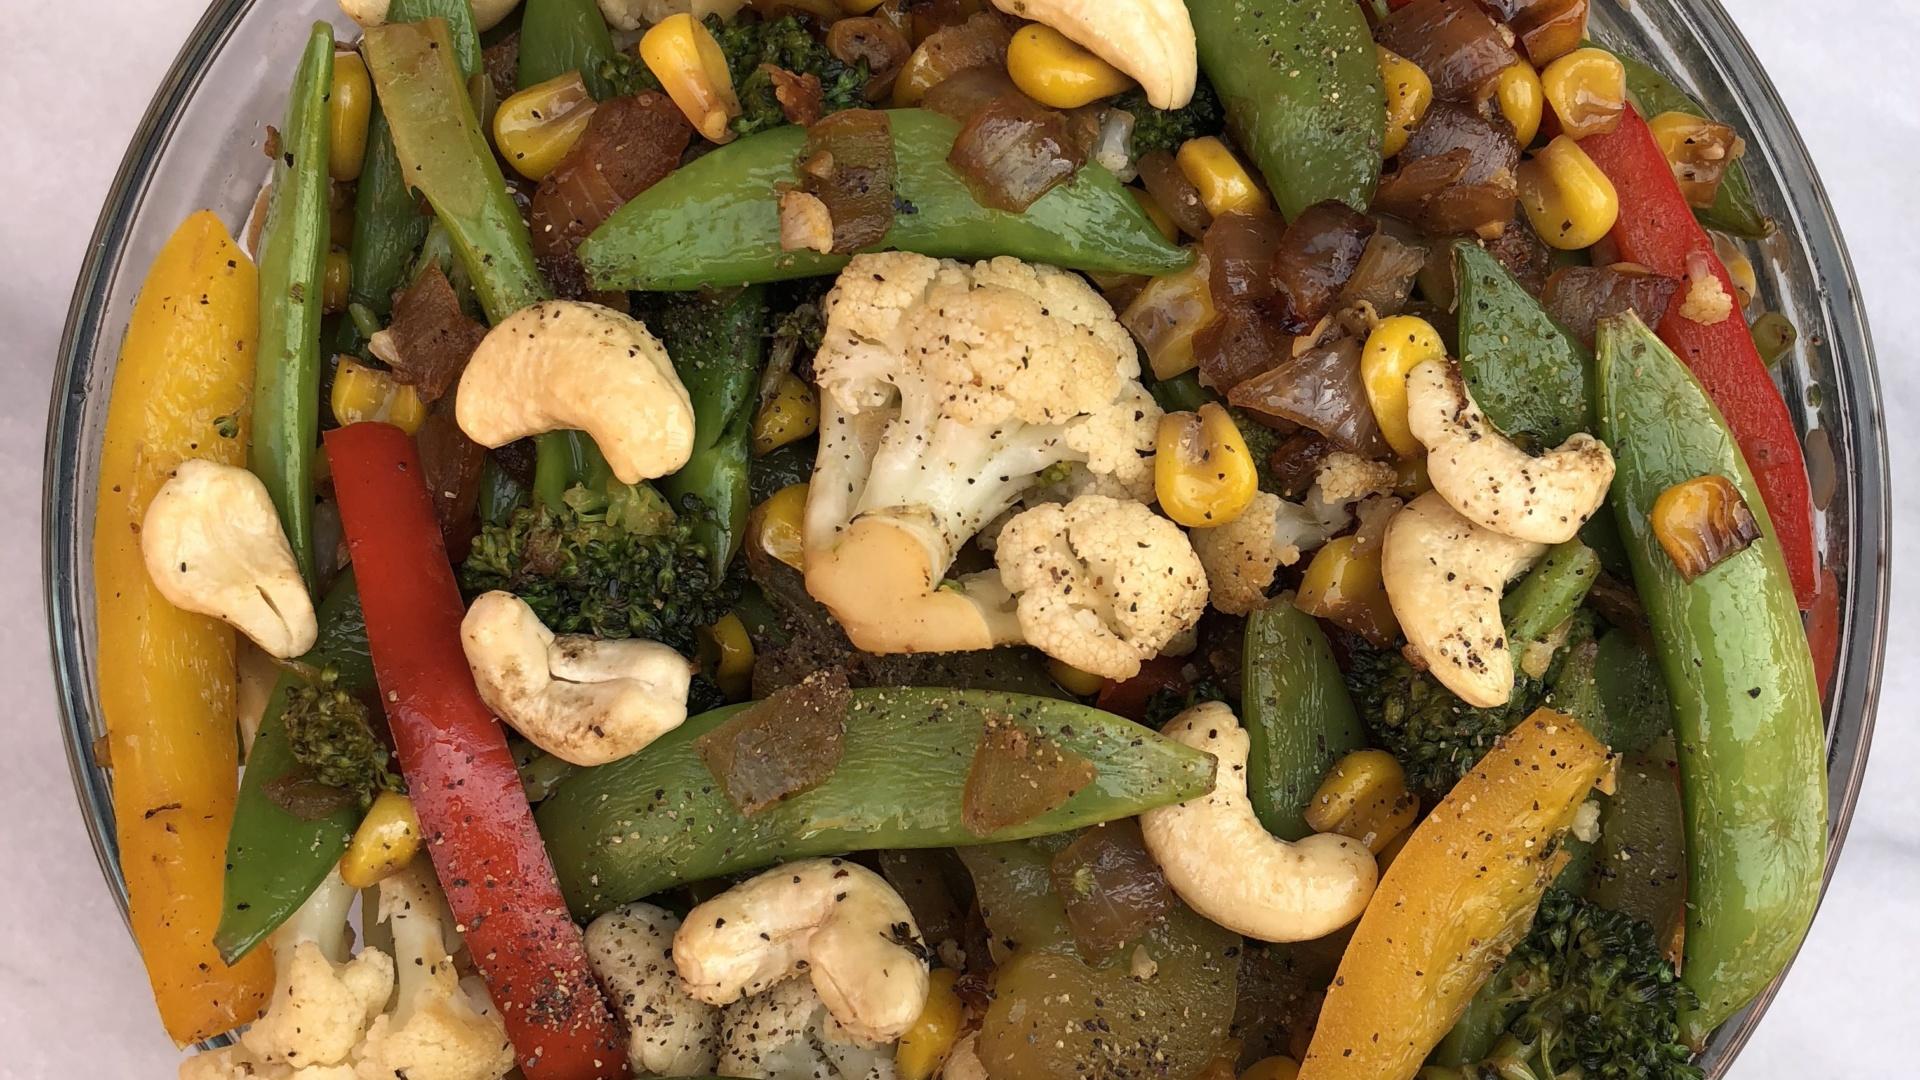 Veggie Stir Fry Gluten Free Follow Me